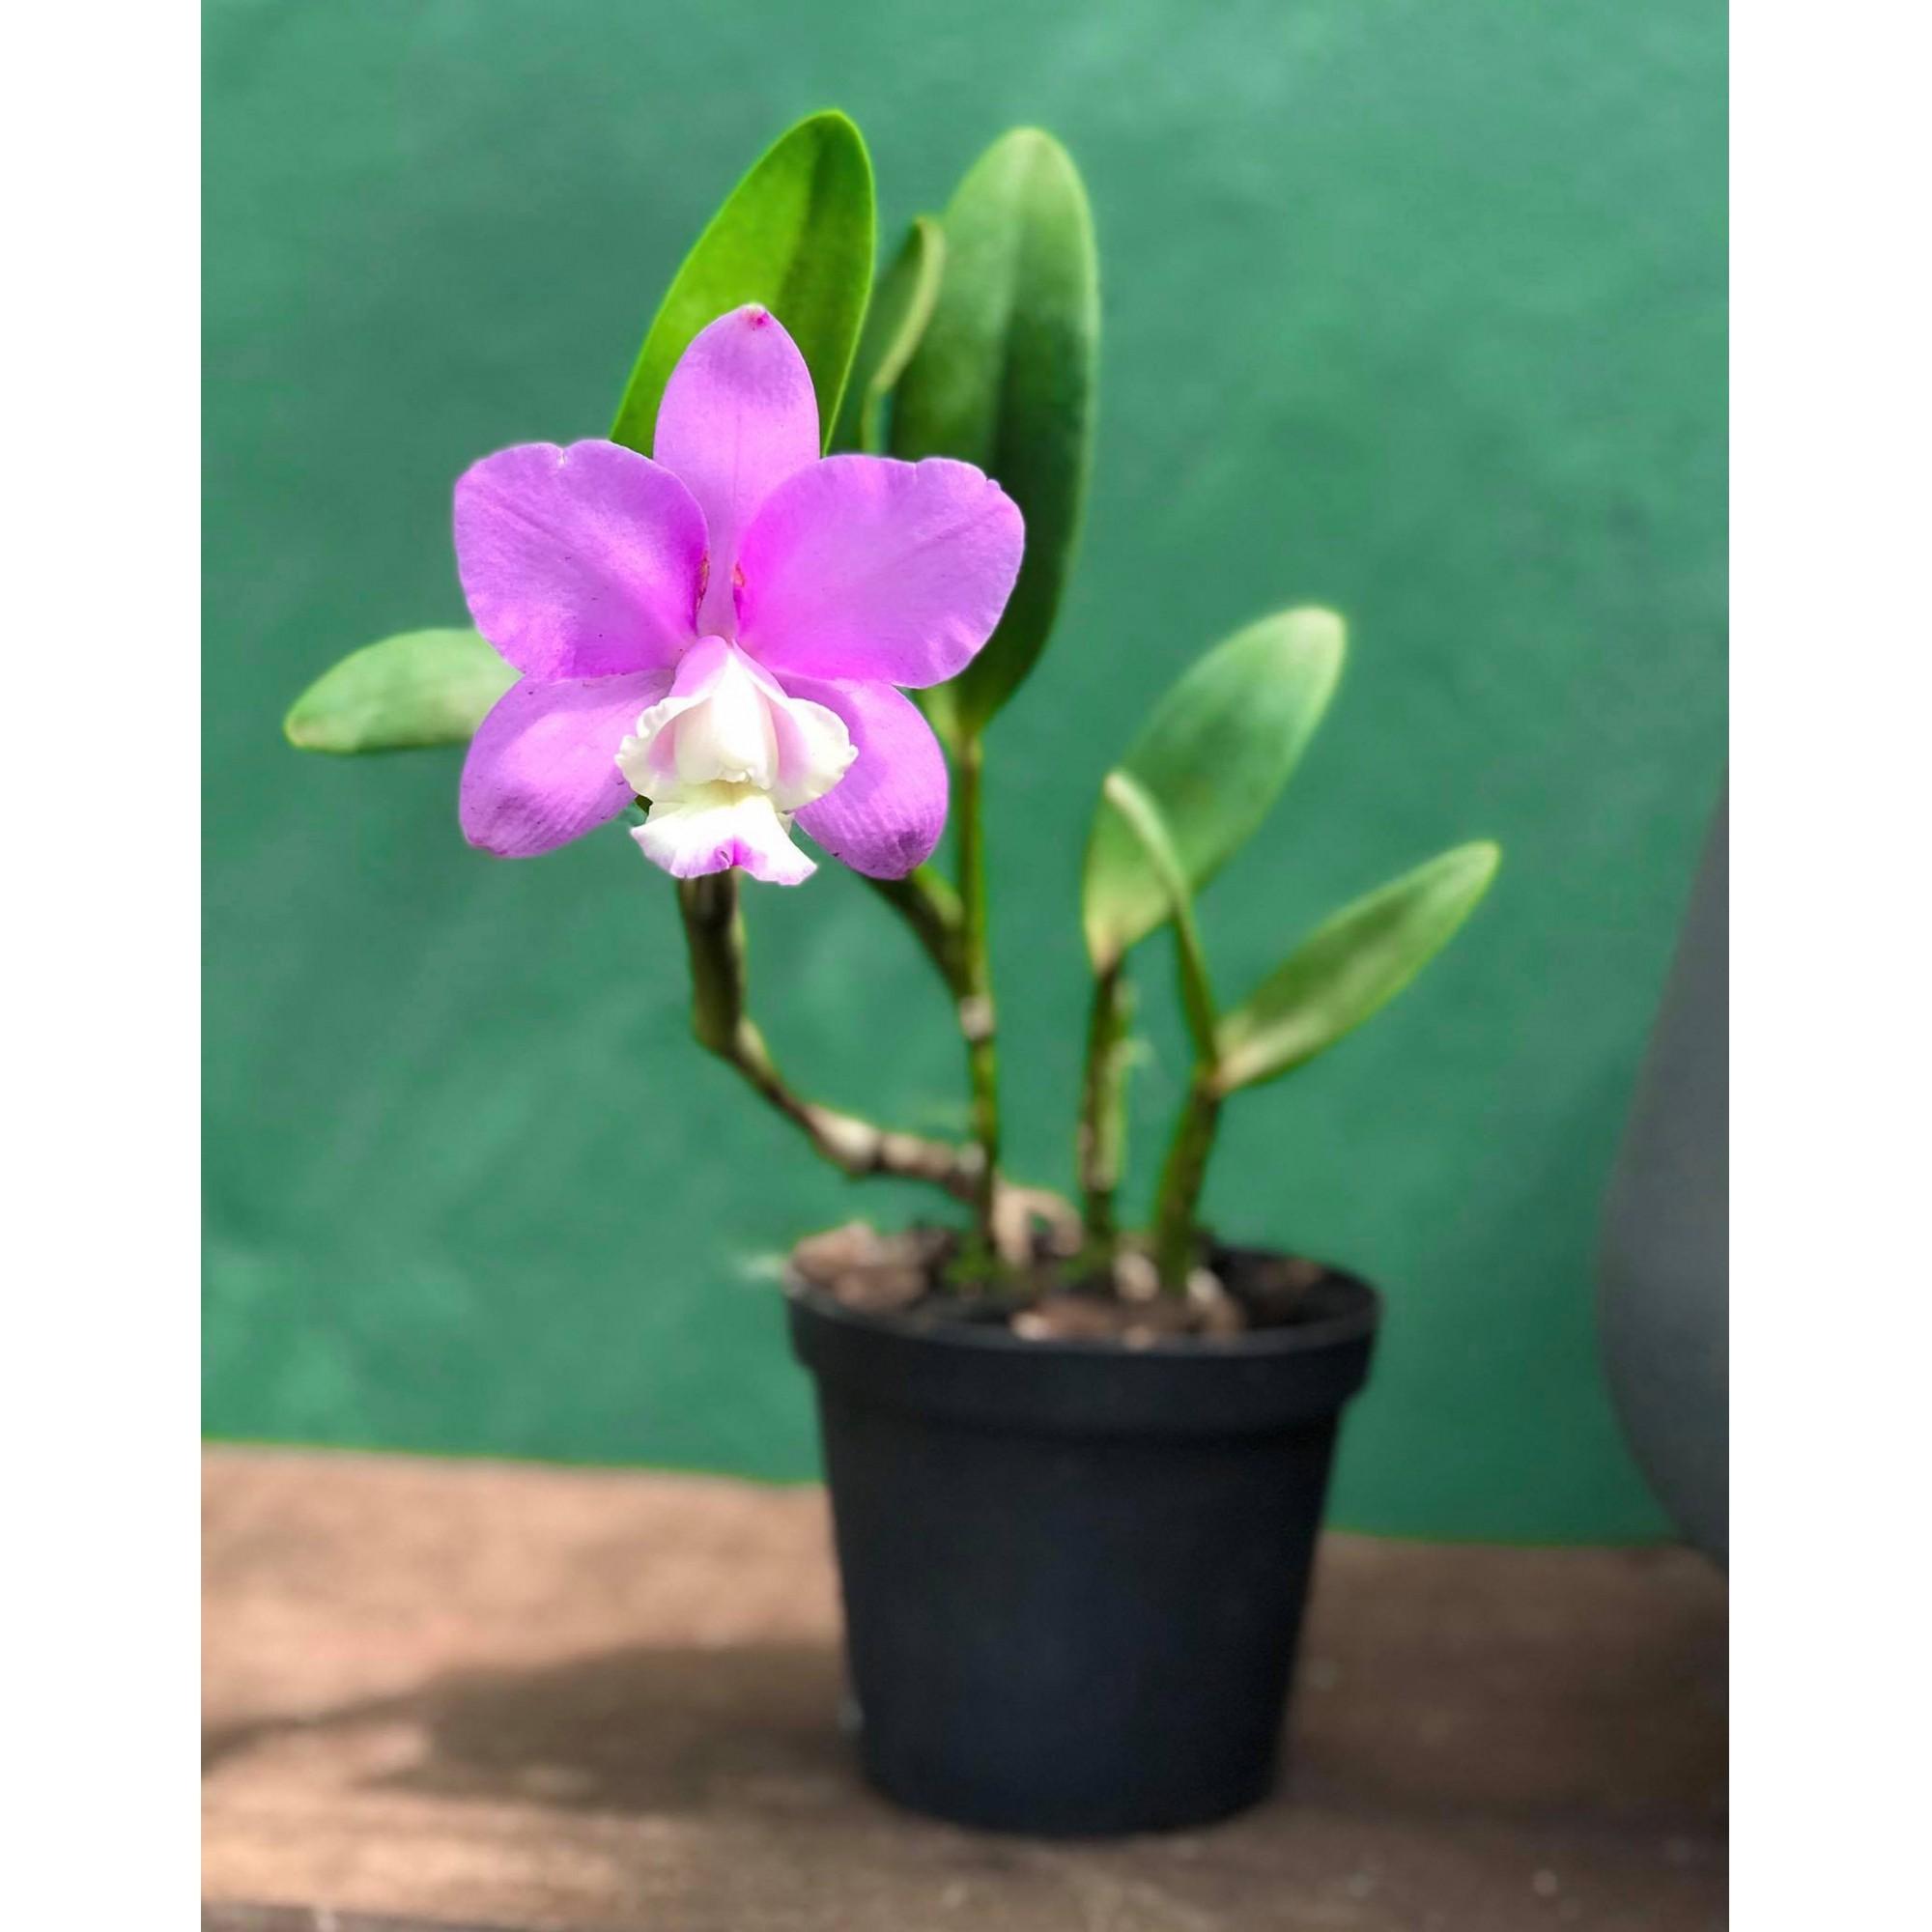 Orquídea C. Loddigesii trilabelo x C. walkeriana alba PL-6715 Semente